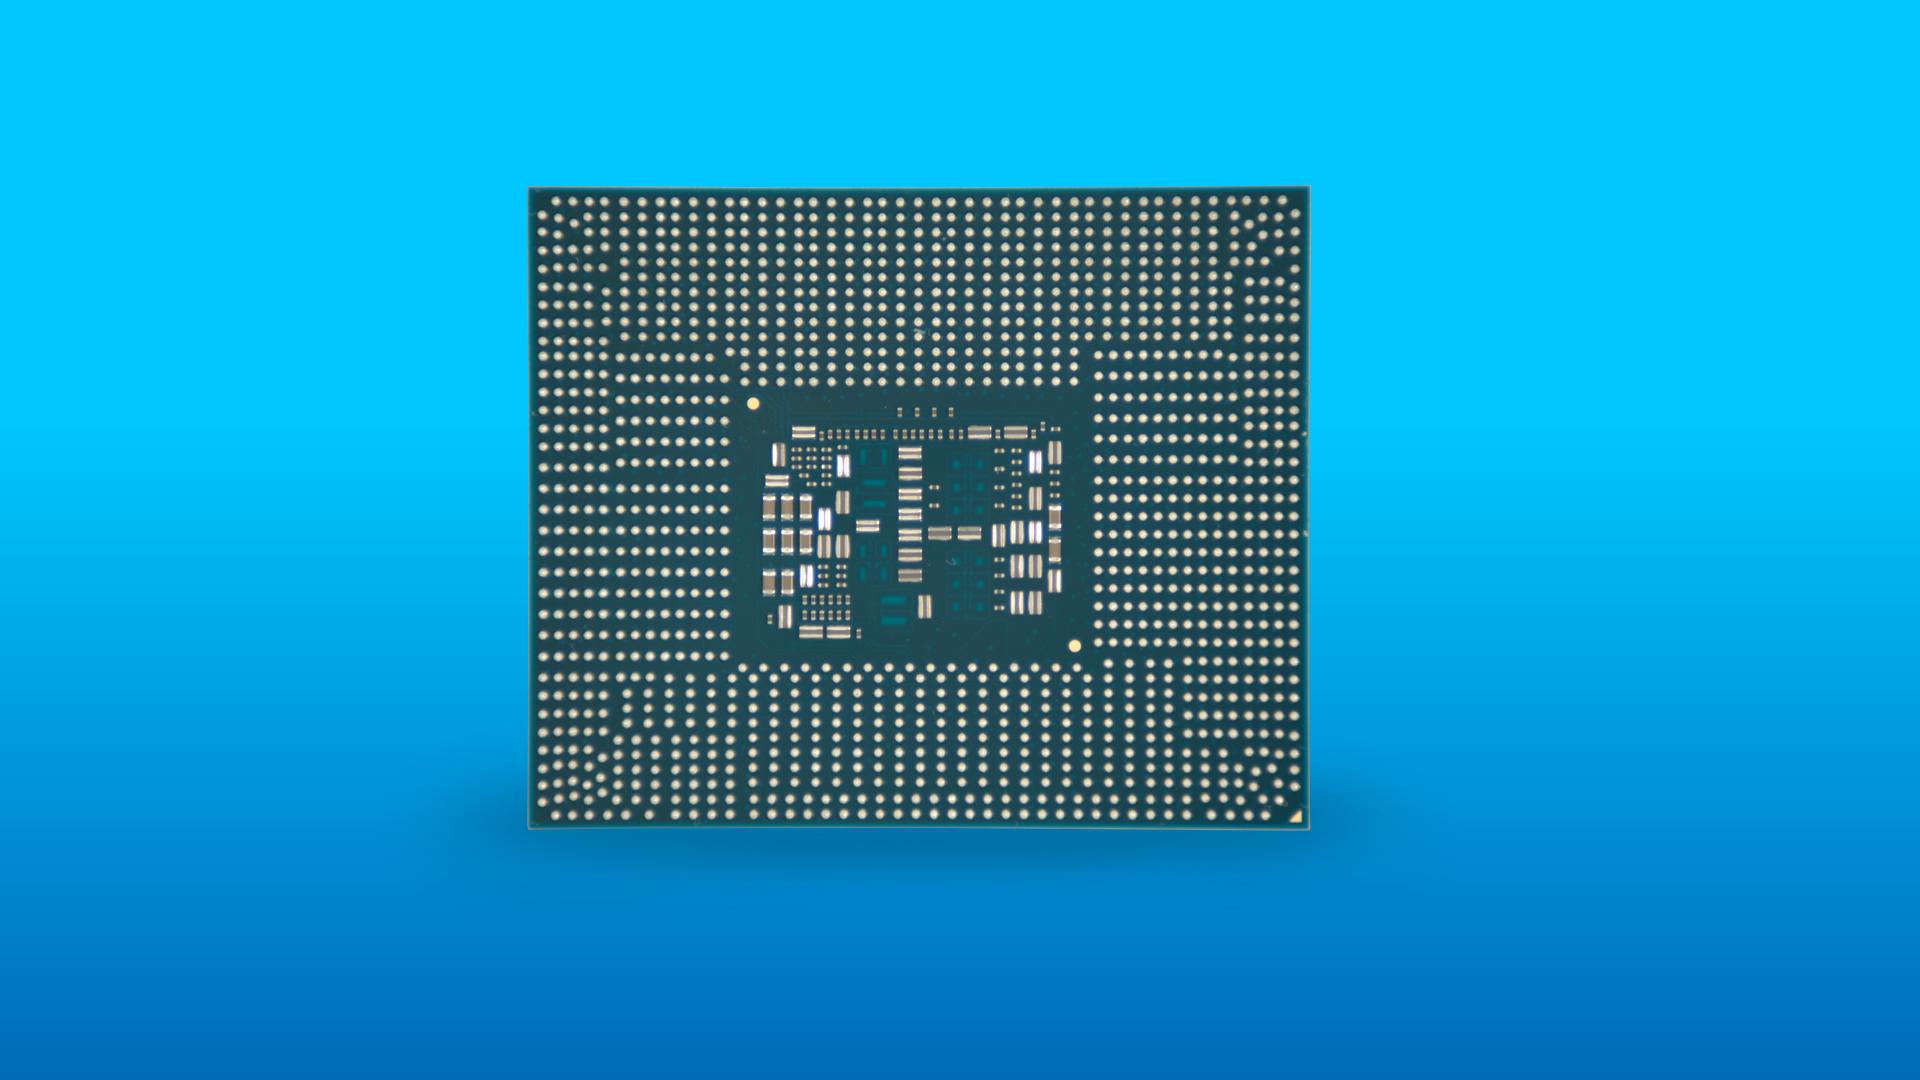 intel server gpu chip 1 อินเทลเดินหน้าวิสัยทัศน์ XPU ด้วย oneAPI และ Intel Server GPU